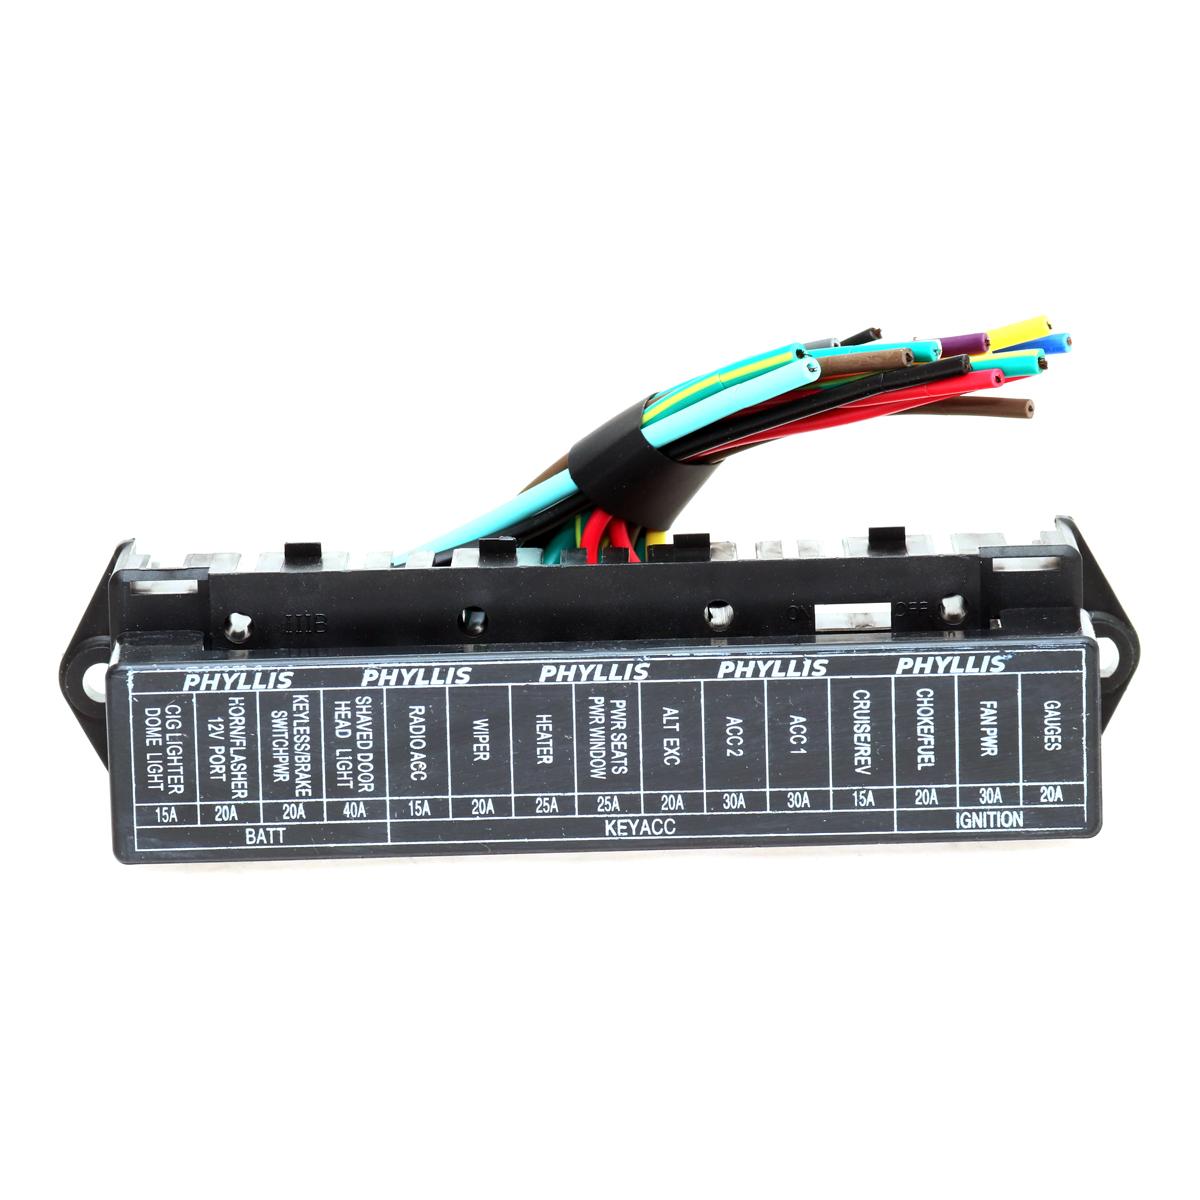 85 Nissan Truck Fuse Box Wiring Diagram Component A Component A Consorziofiuggiturismo It